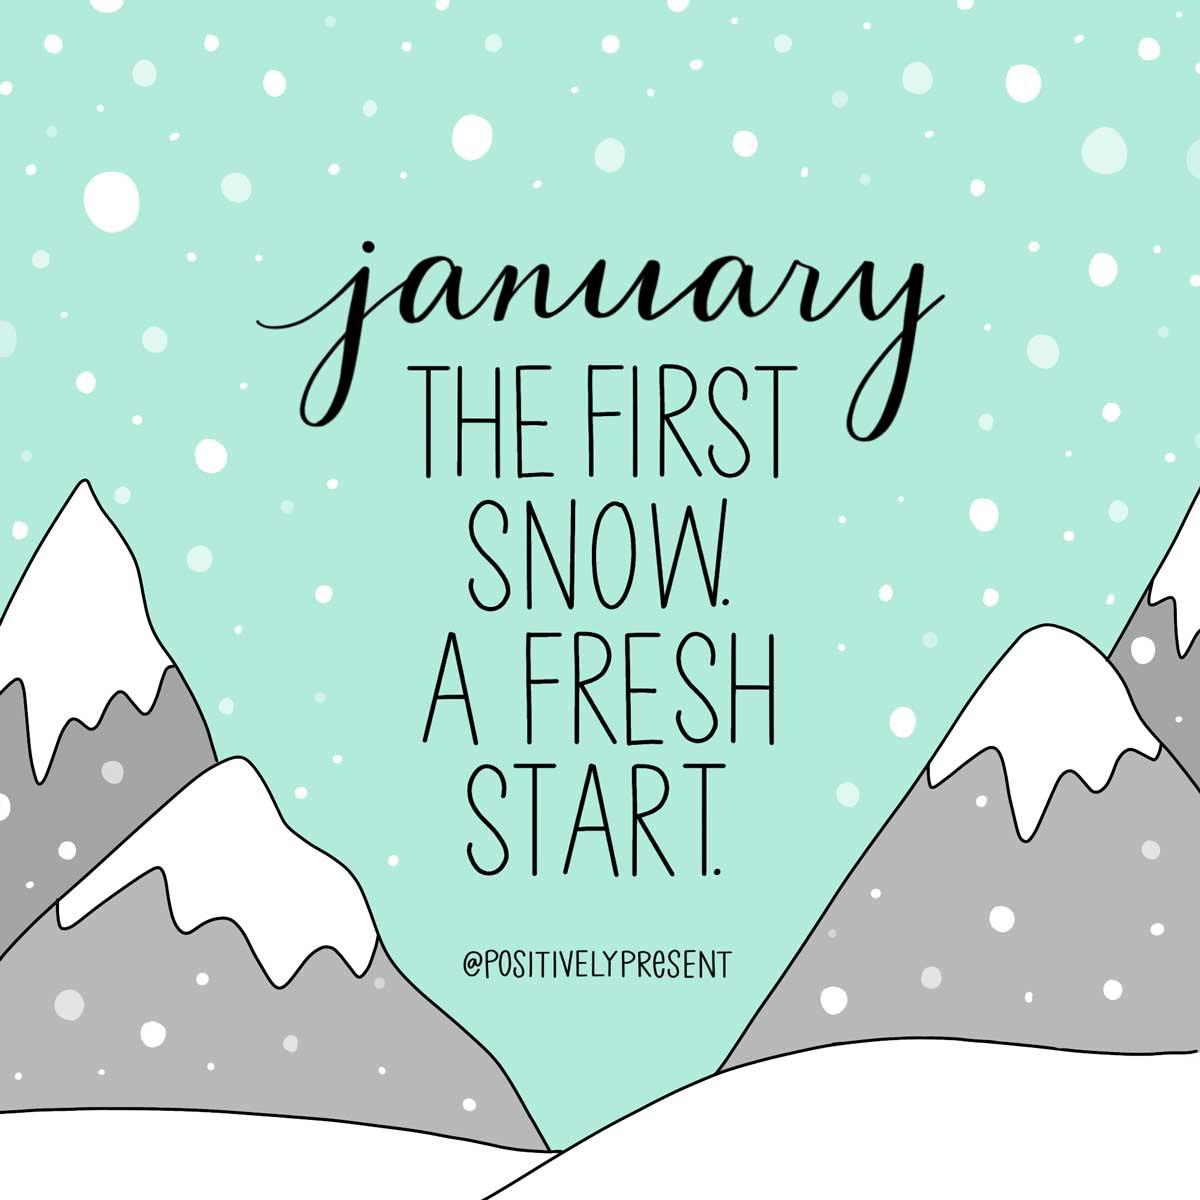 new year fresh start quote on aqua snow scene art.